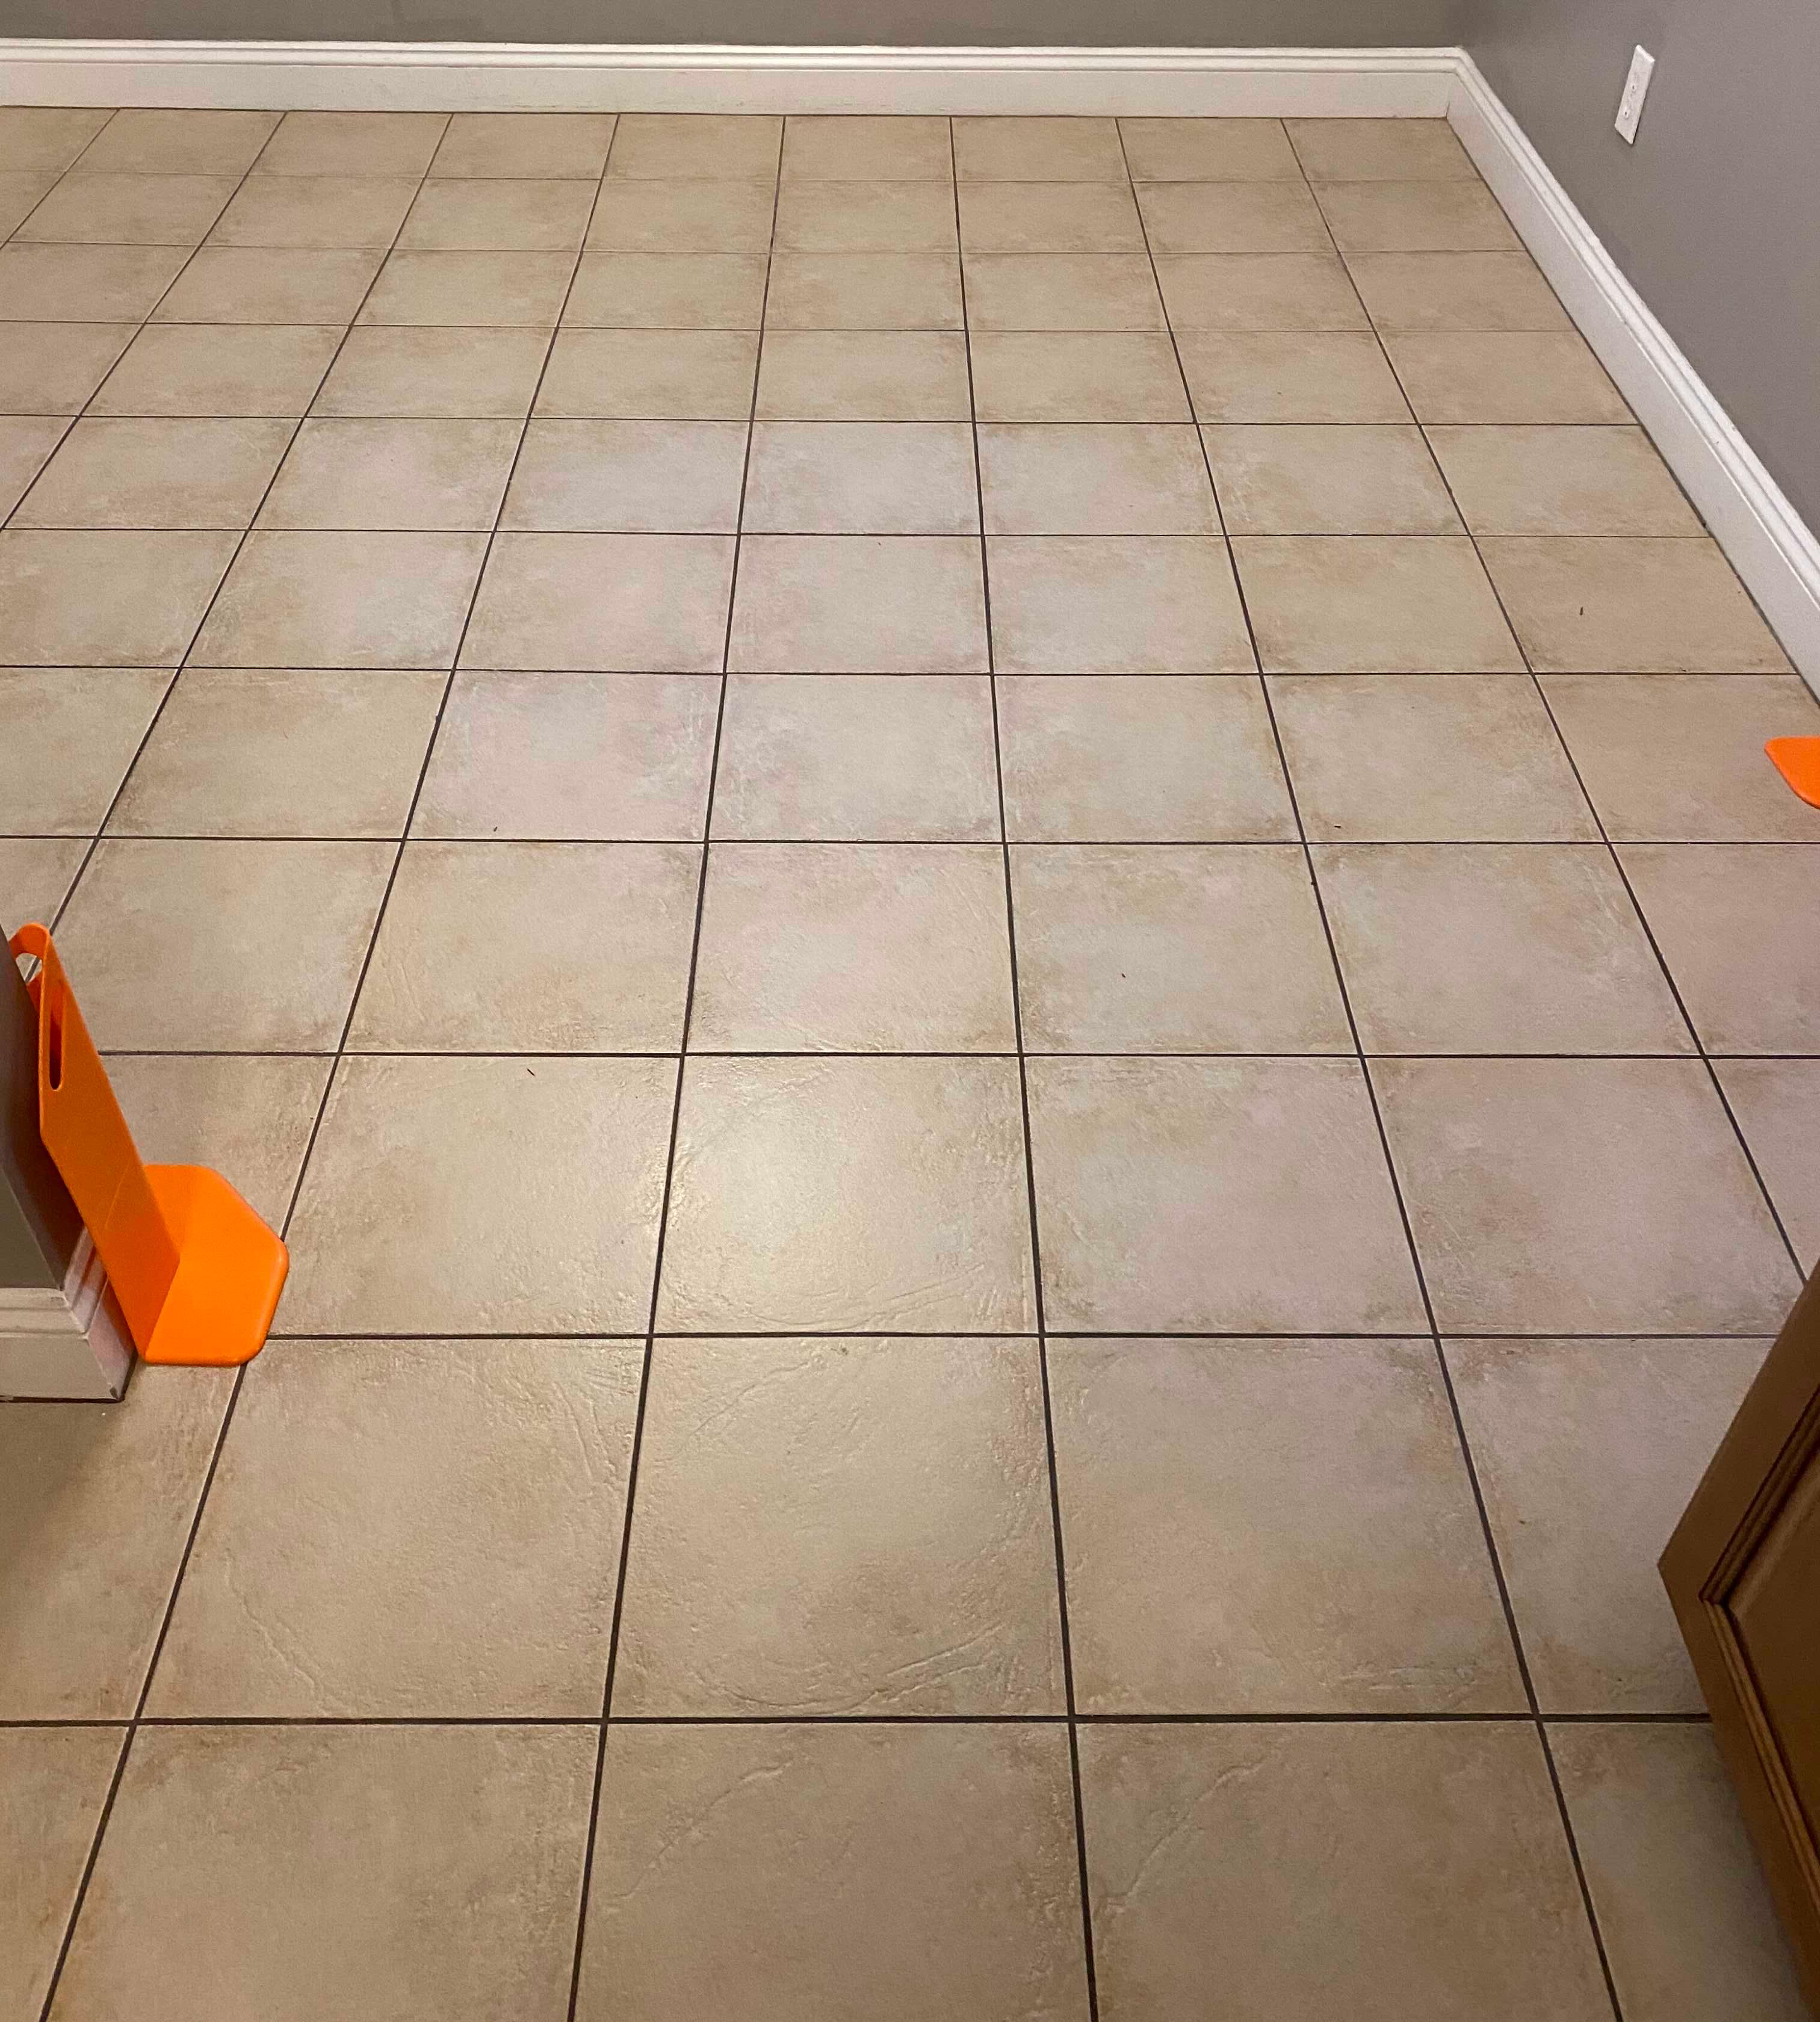 Floor Cleaning/Polishing/Waxing Project